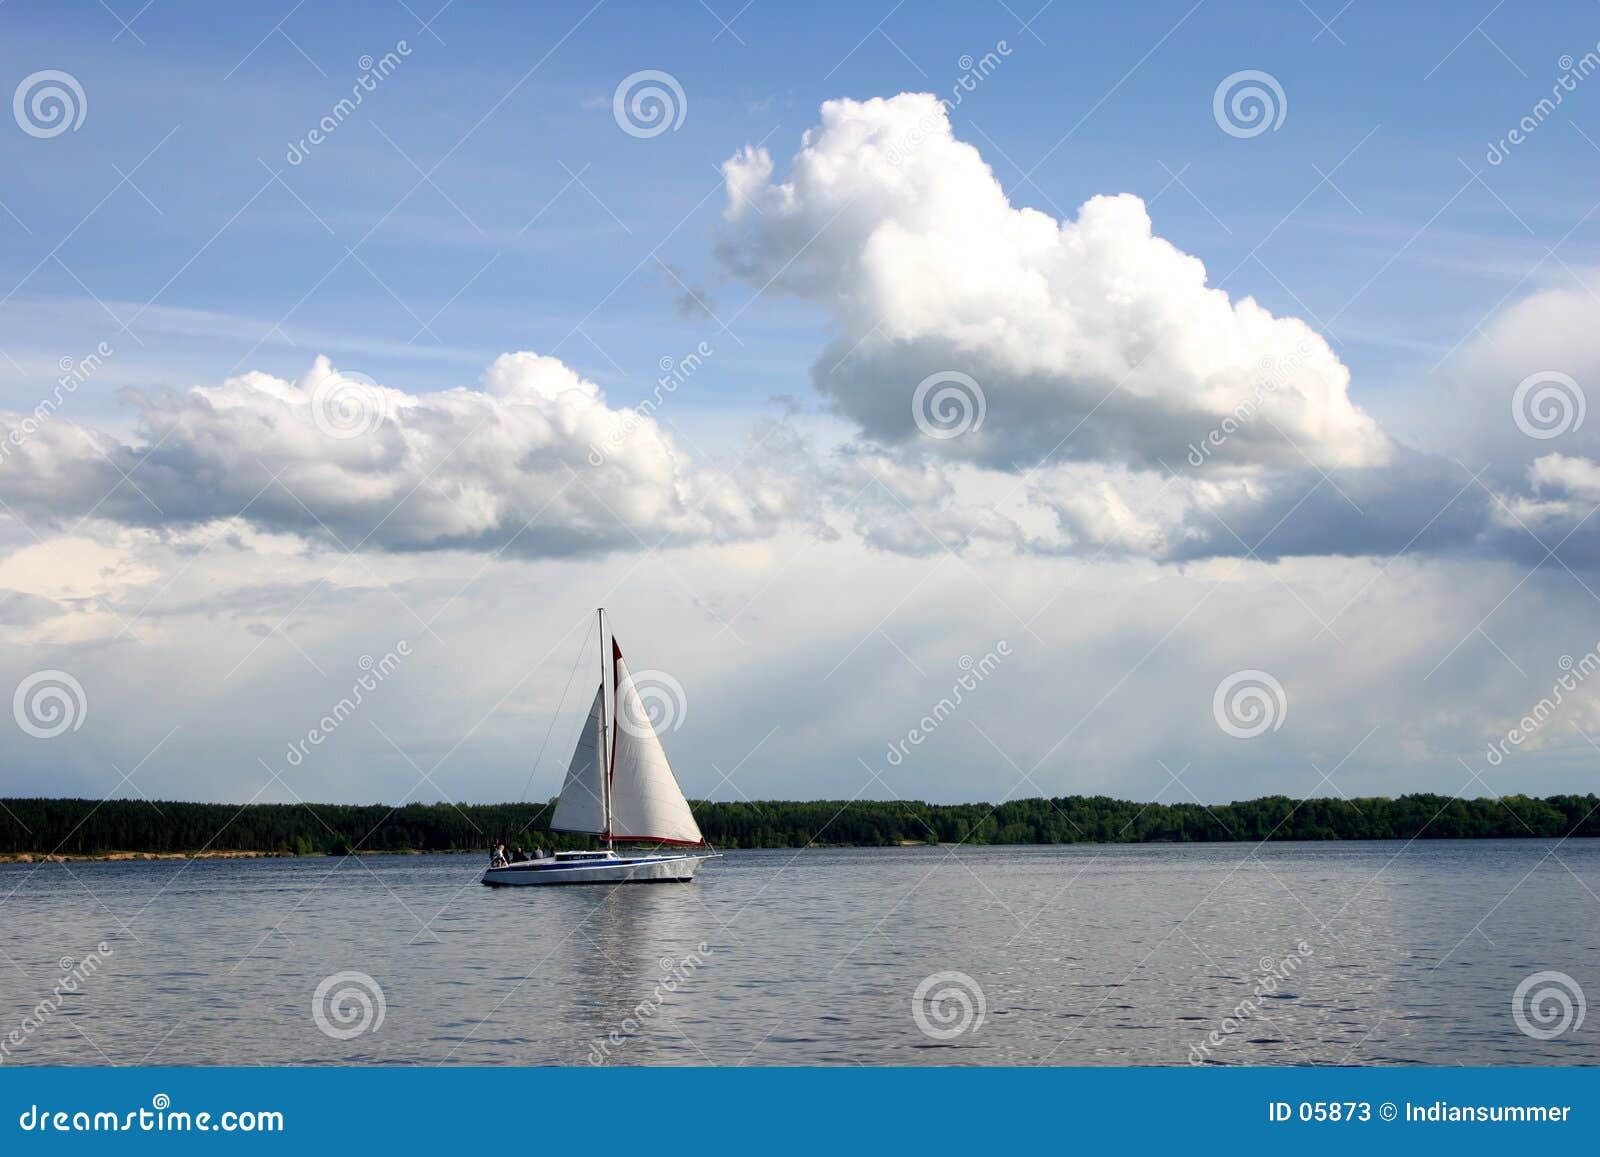 Je navigue?